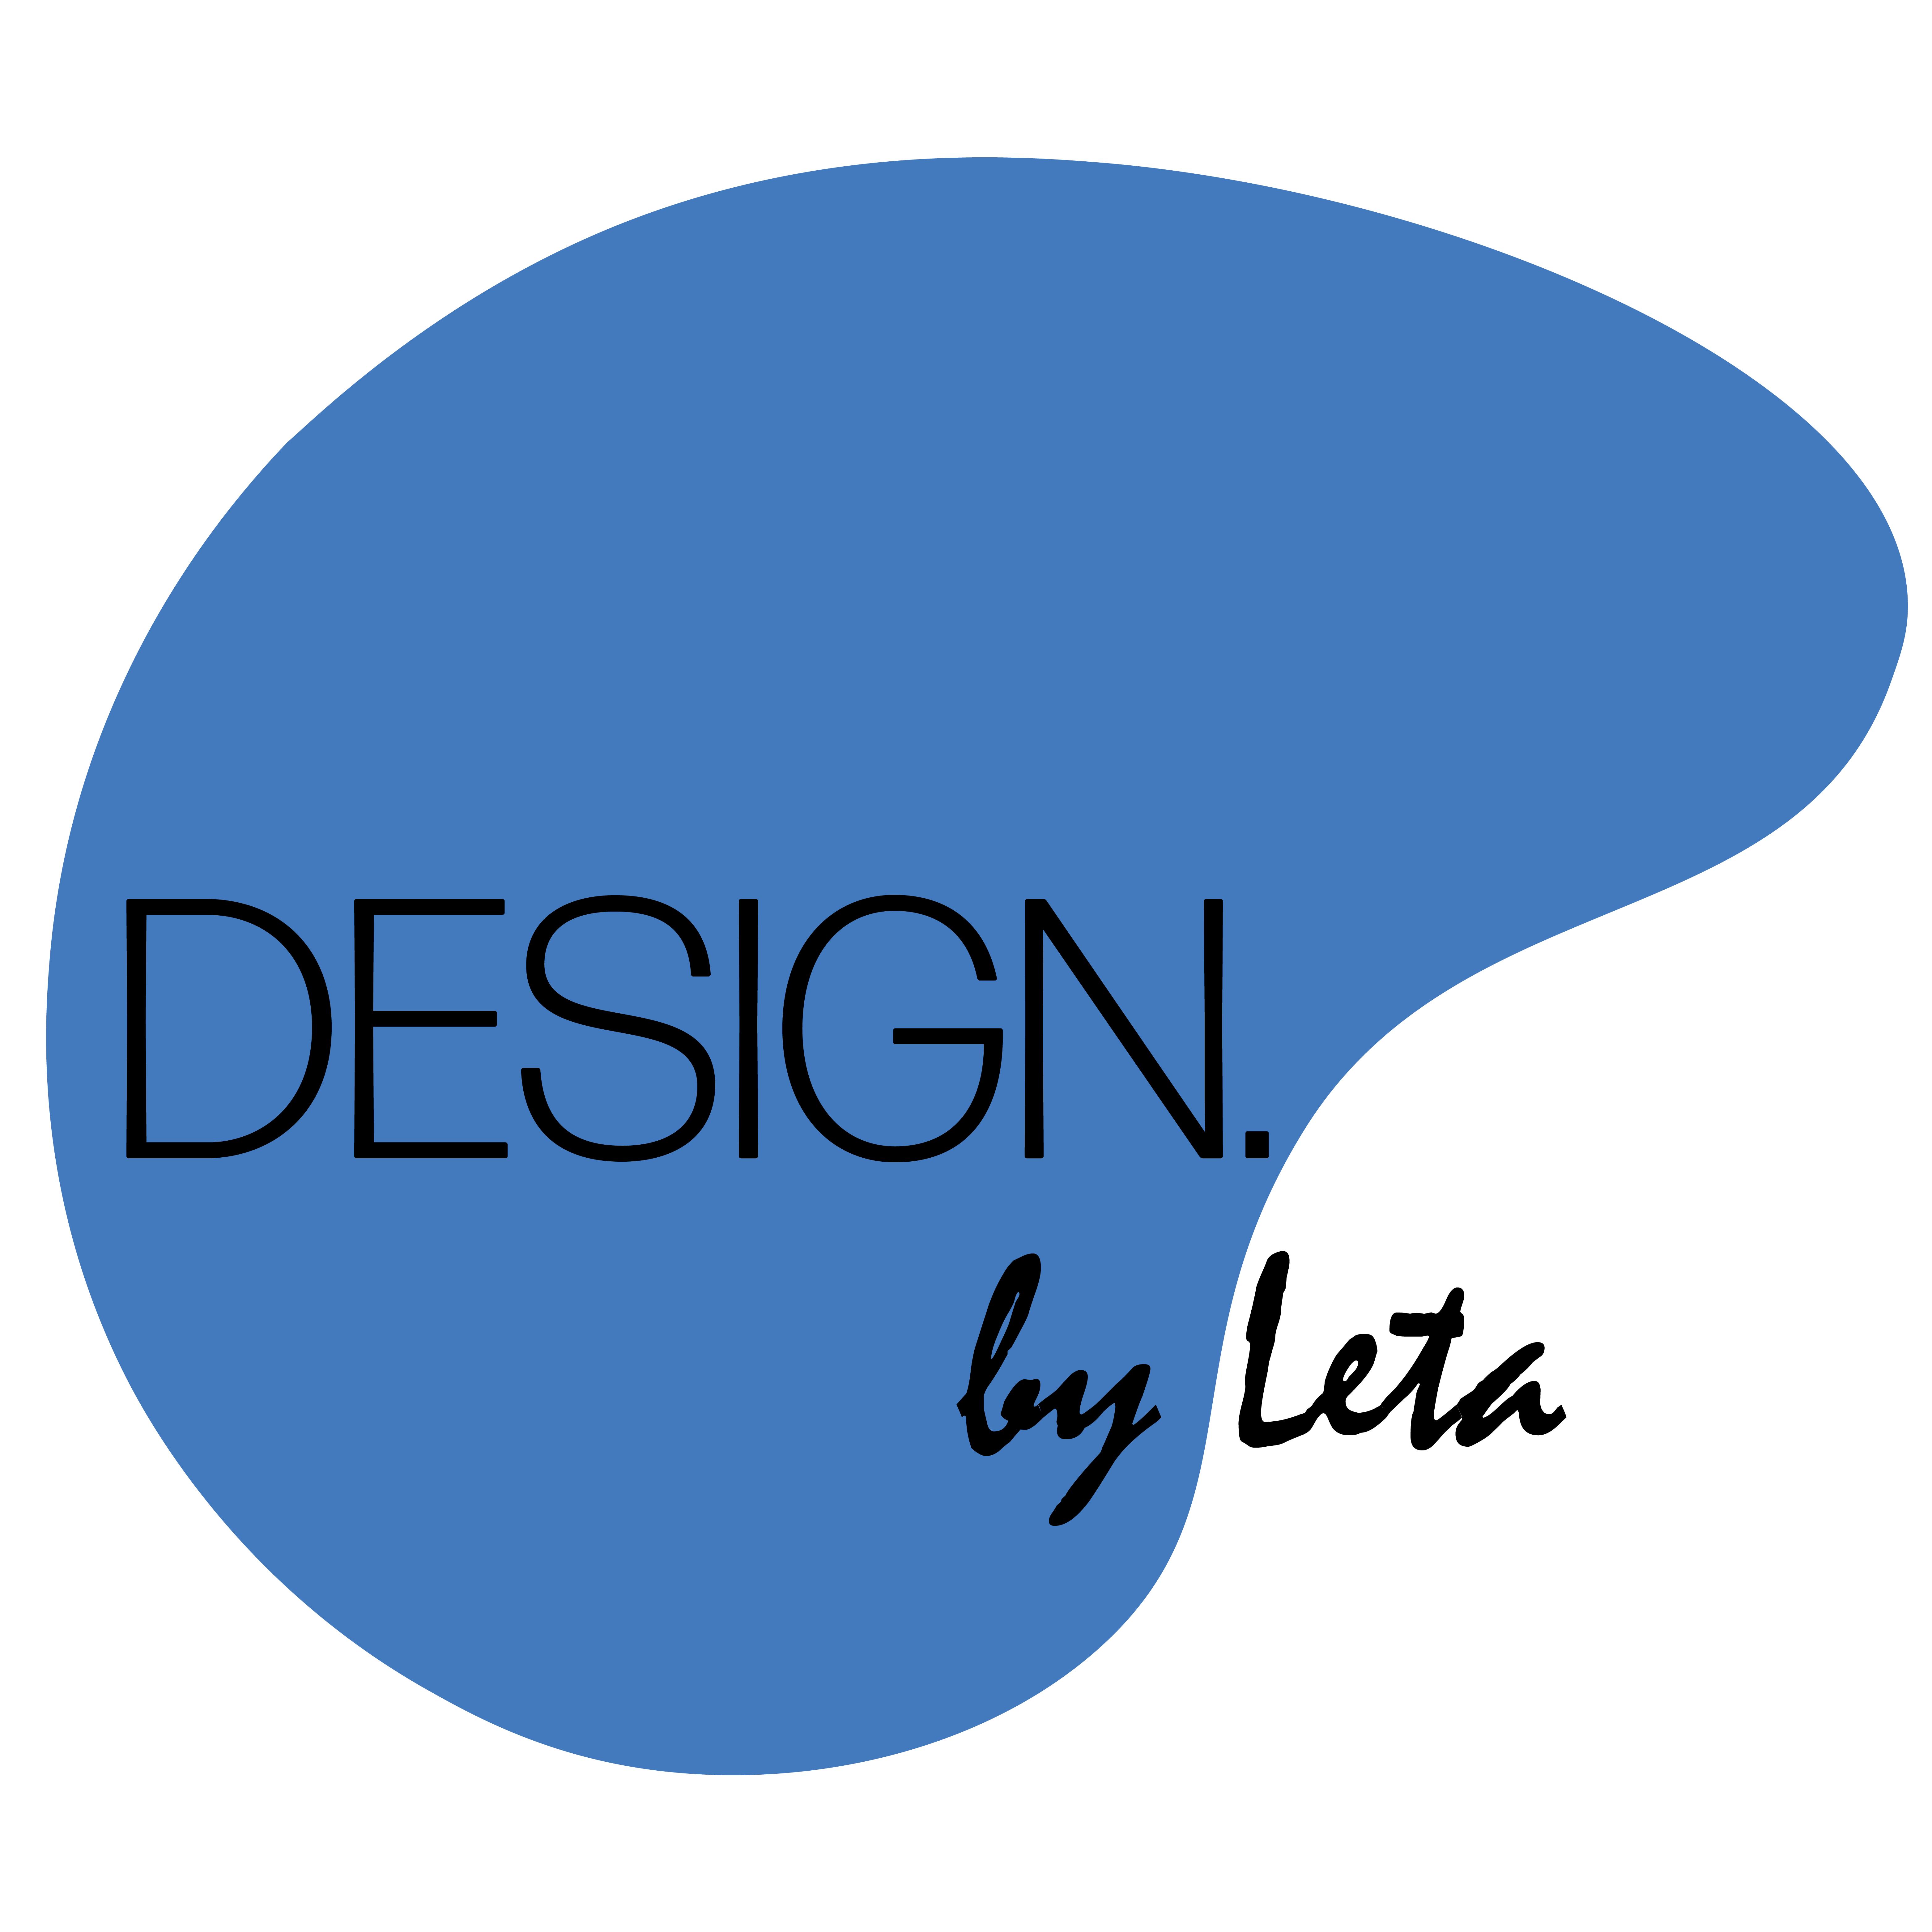 Design by Leta